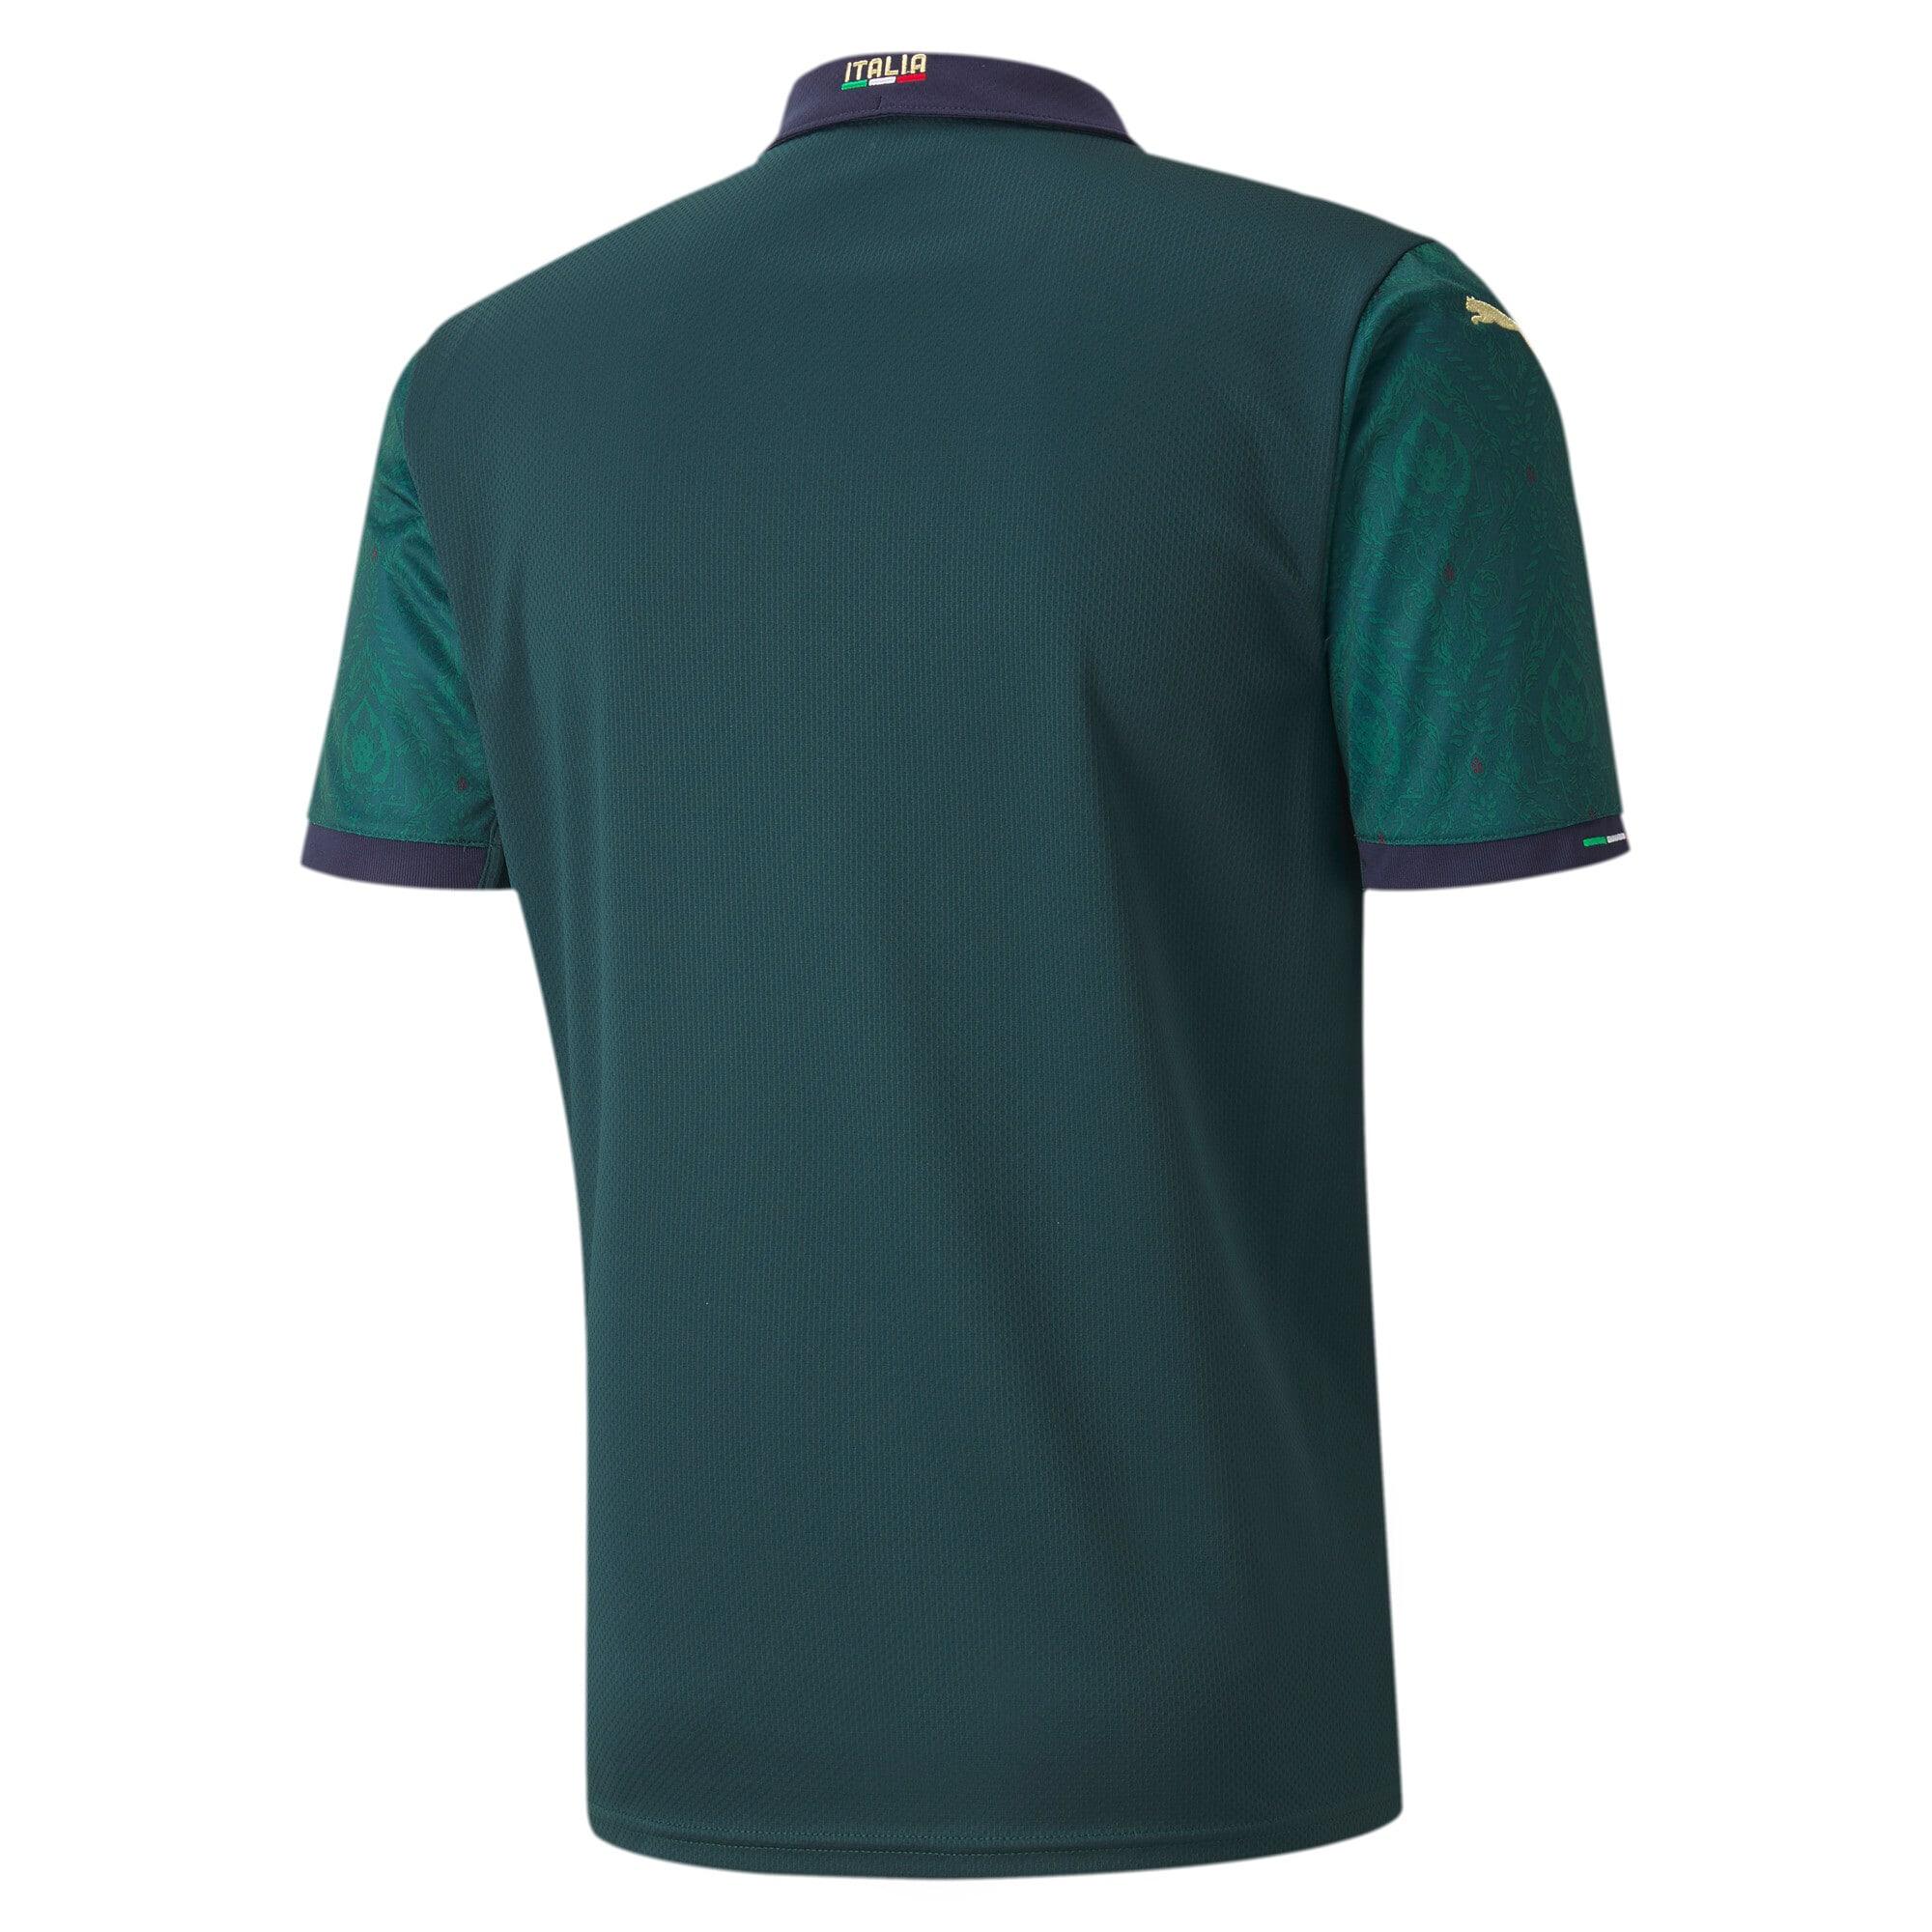 Thumbnail 2 of FIGC Men's Third Replica Jersey, Ponderosa Pine-Peacoat, medium